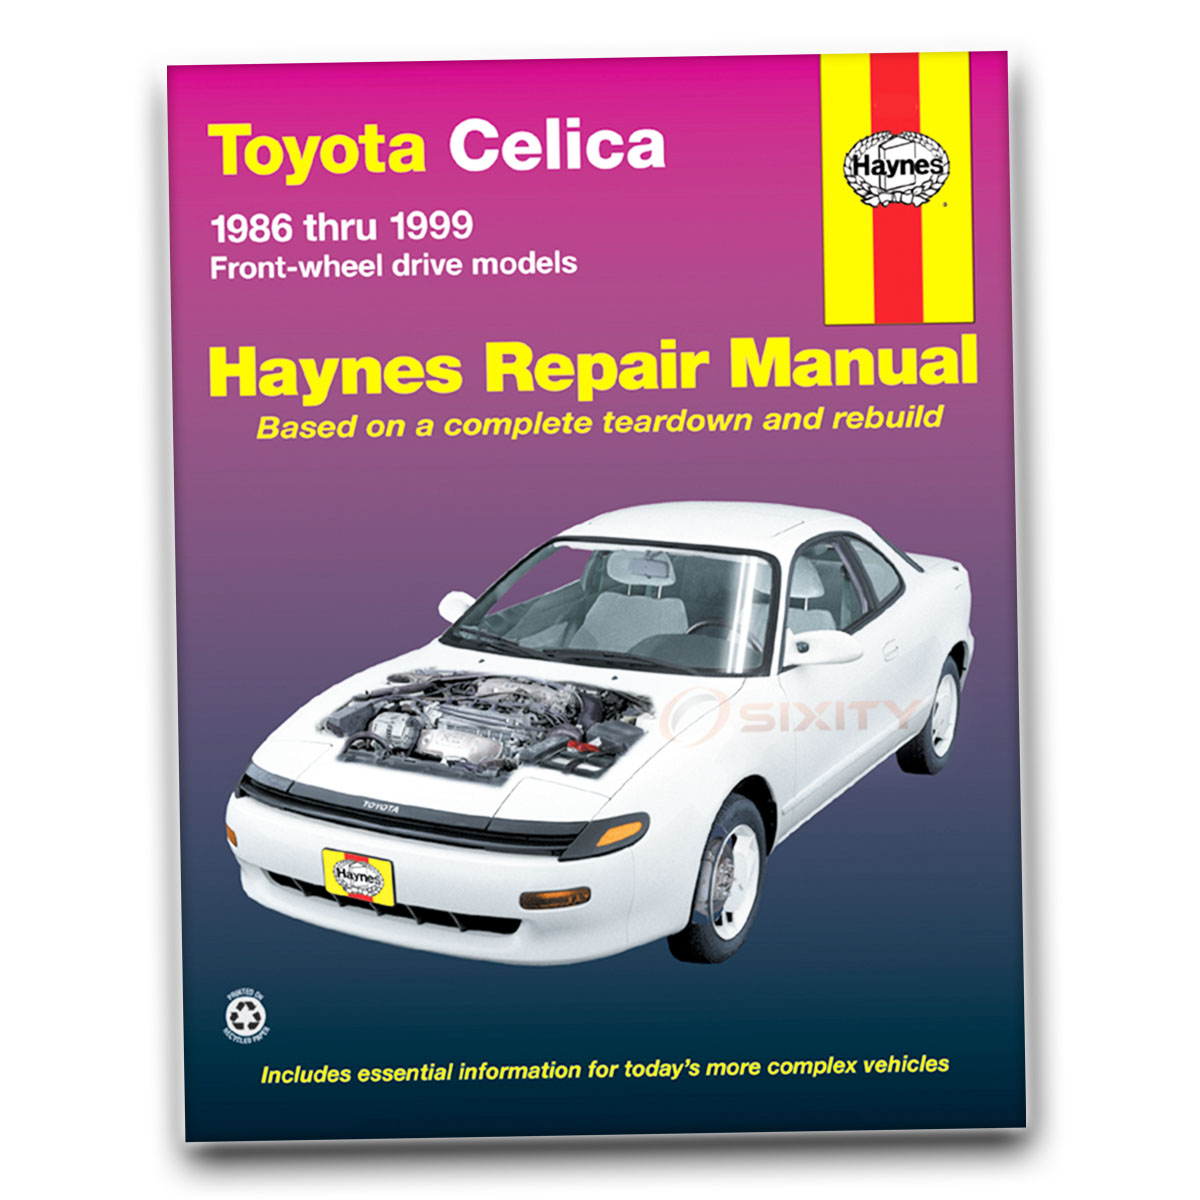 toyota celica haynes repair manual all trac gts st shop service rh ebay com 86 Toyota Celica 85 Toyota Celica